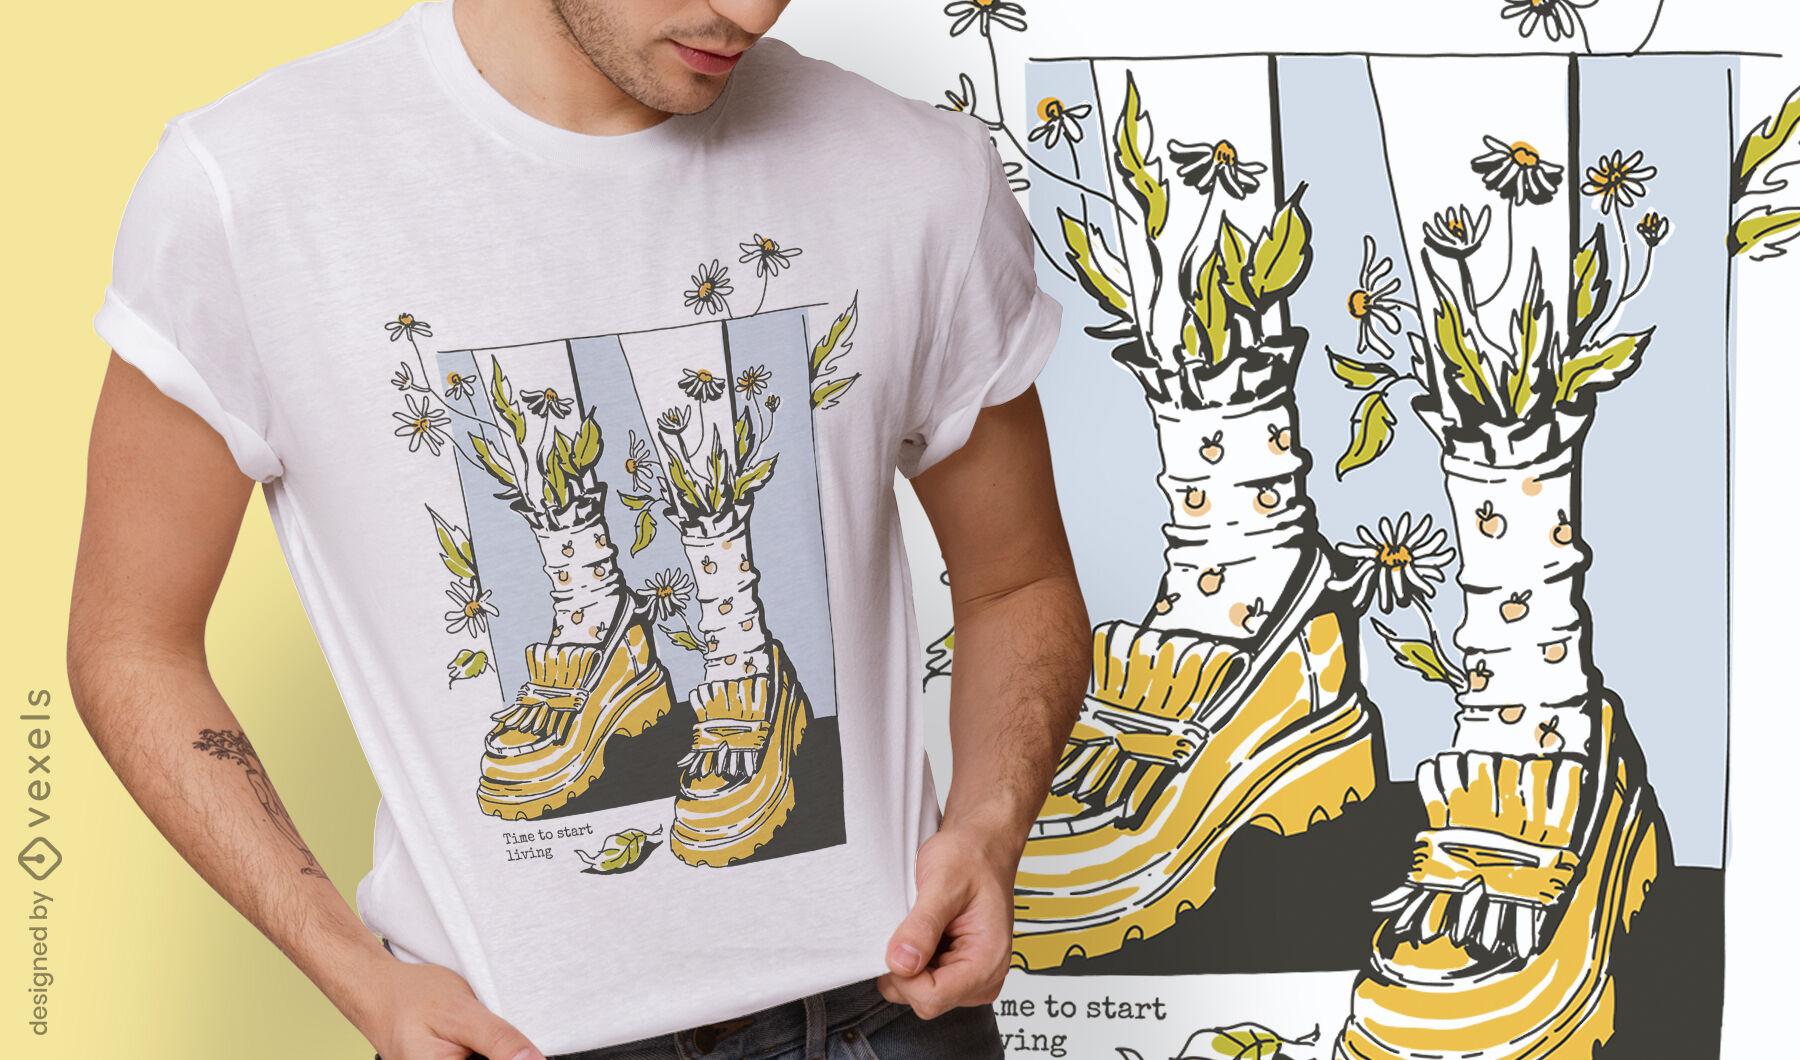 Design de camisetas com roupas de estilo de vida Cottagecore